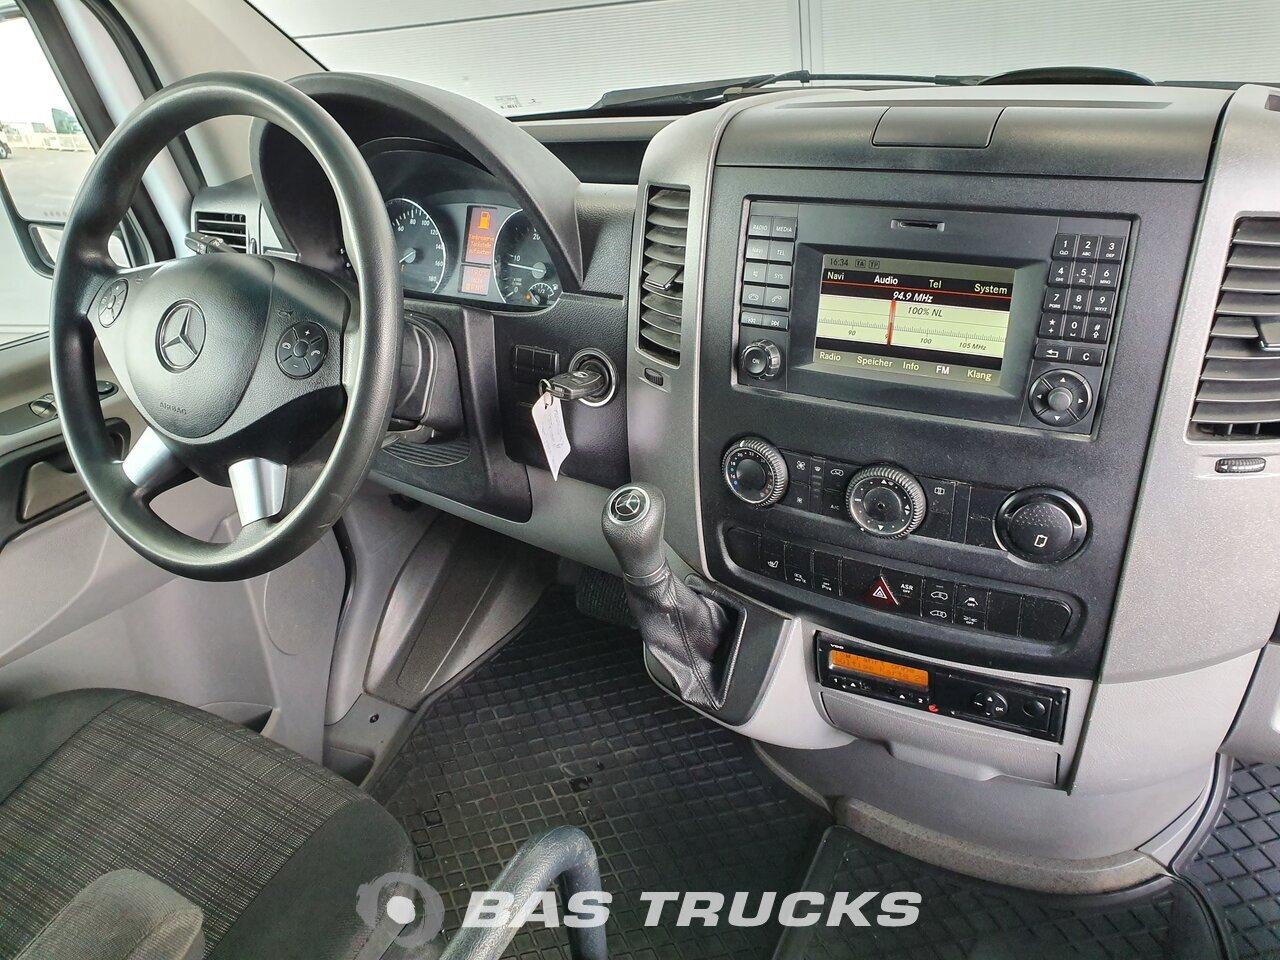 For sale at BAS Trucks: Mercedes Sprinter 12/2014